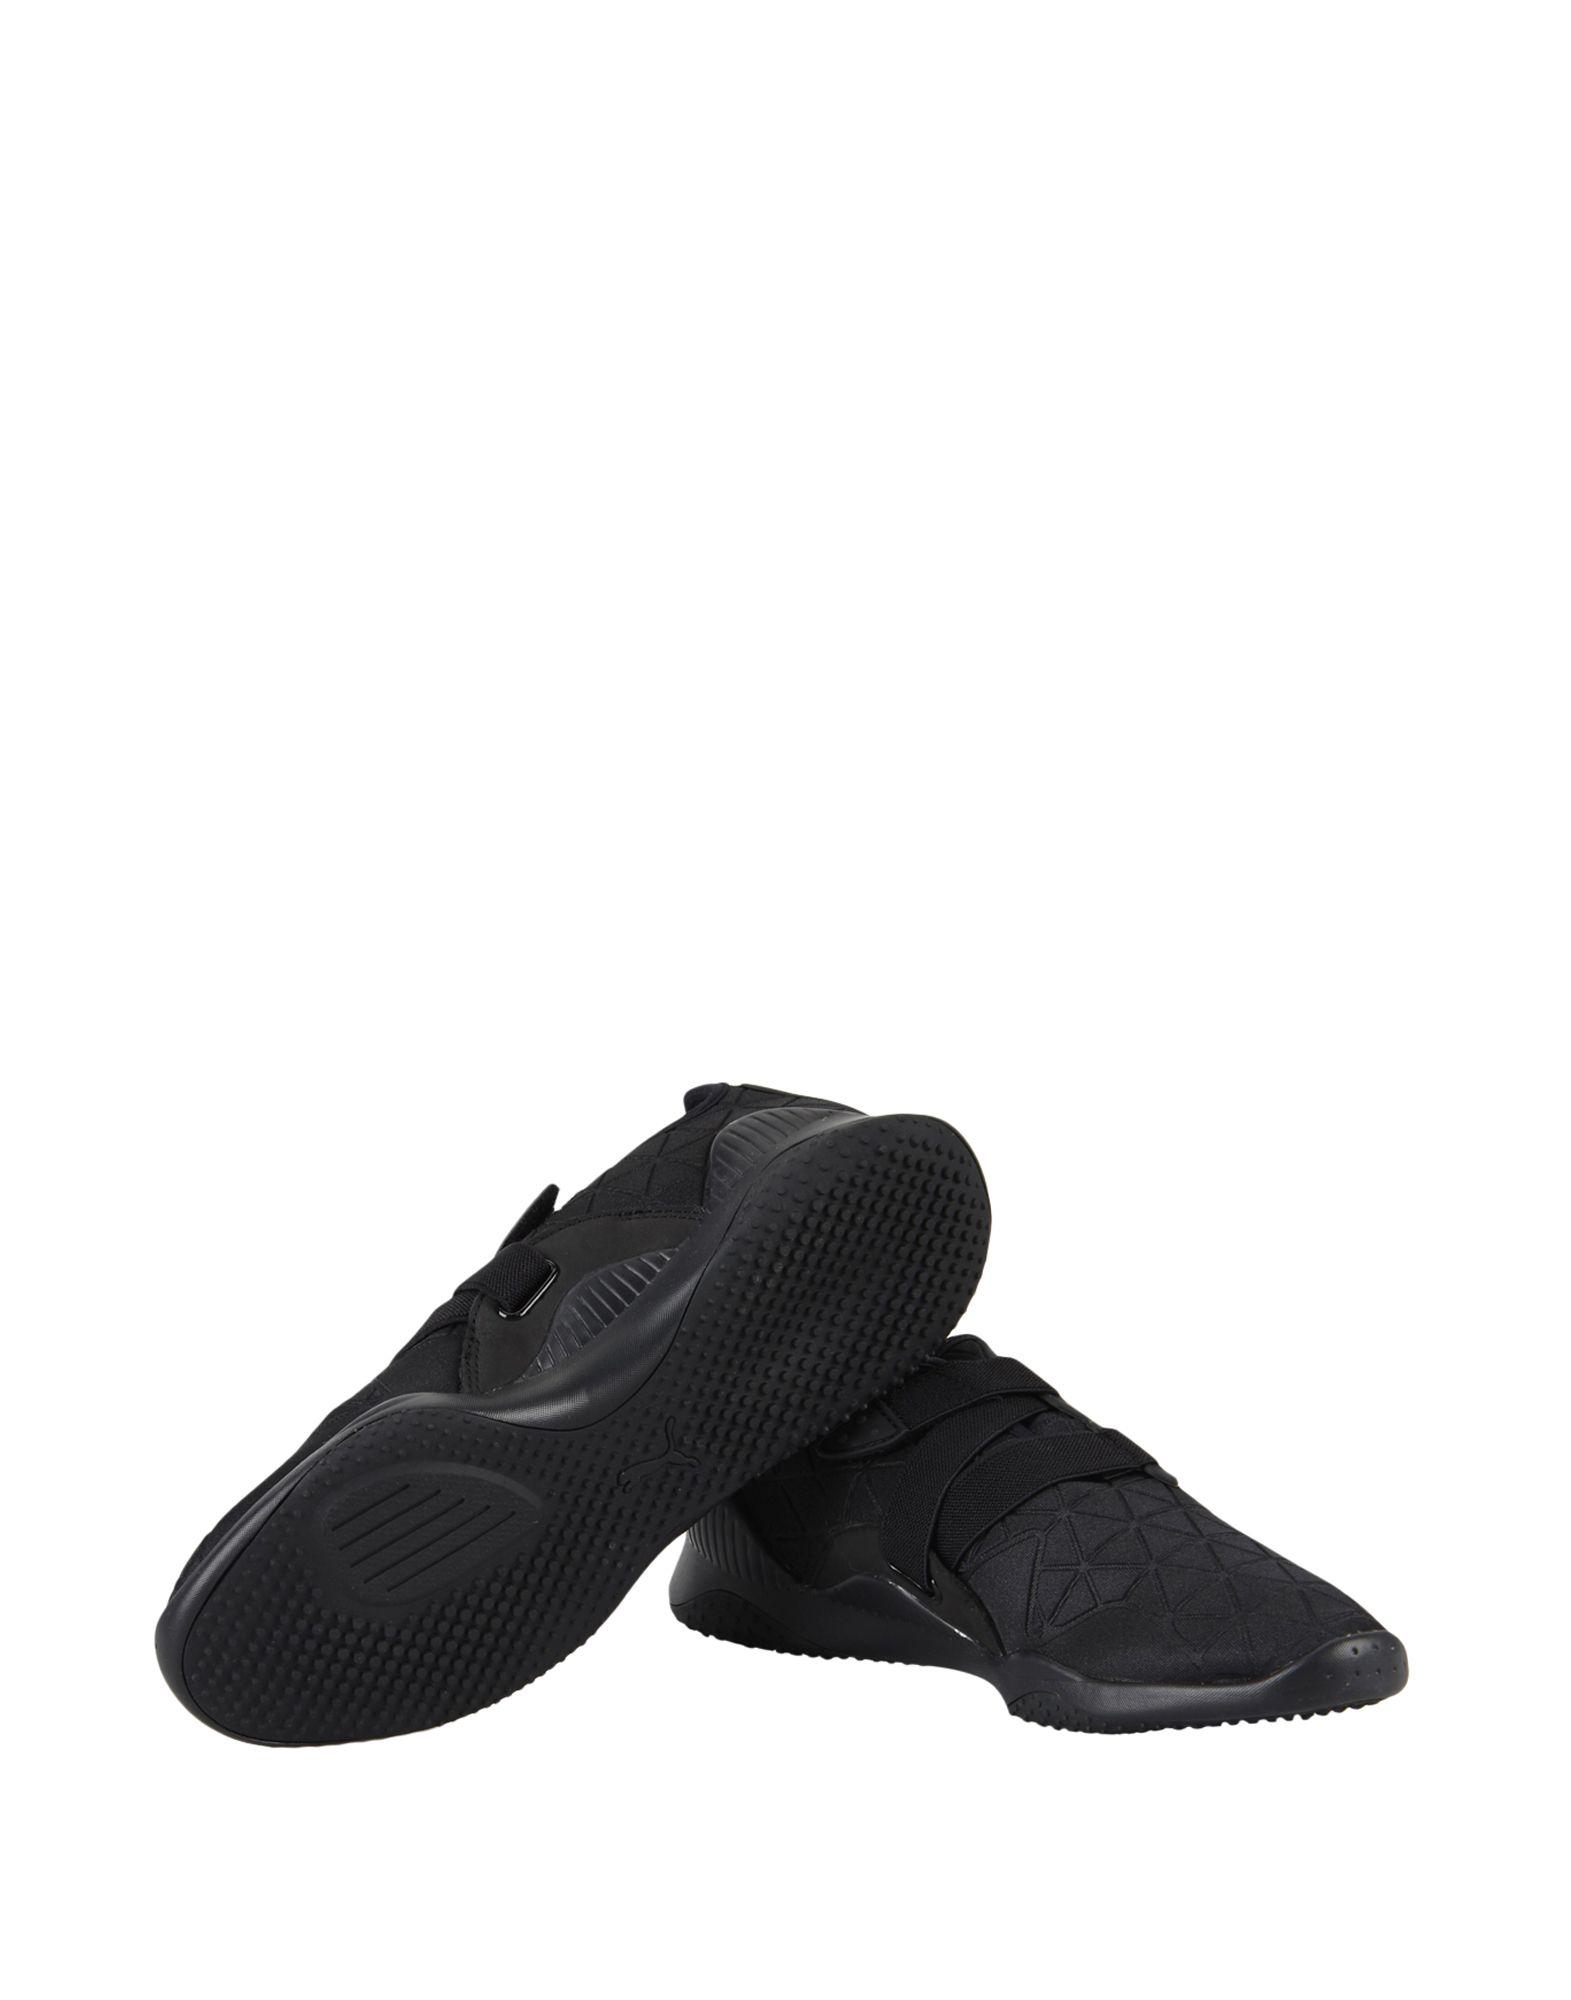 Sneakers Puma Mostro Lfw - Femme - Sneakers Puma sur